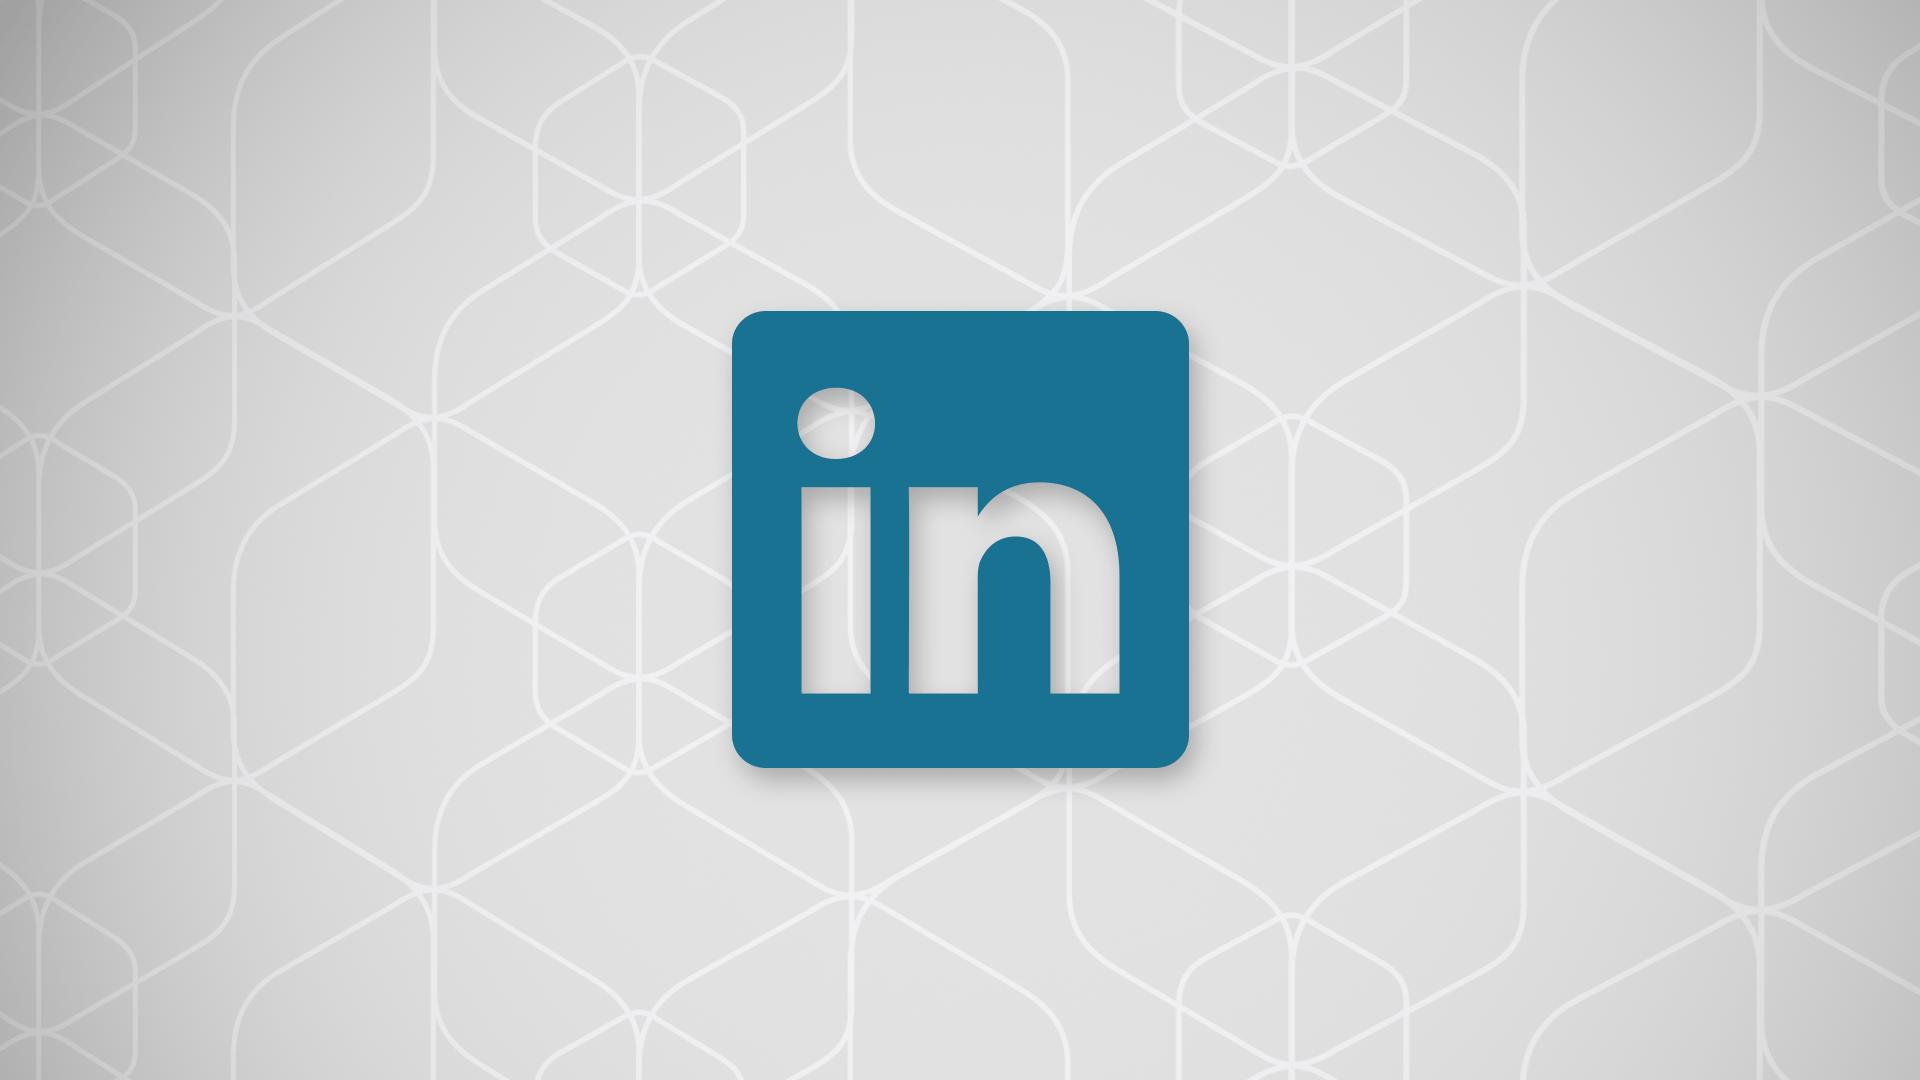 linkedin emblem logo wallpaper 65636